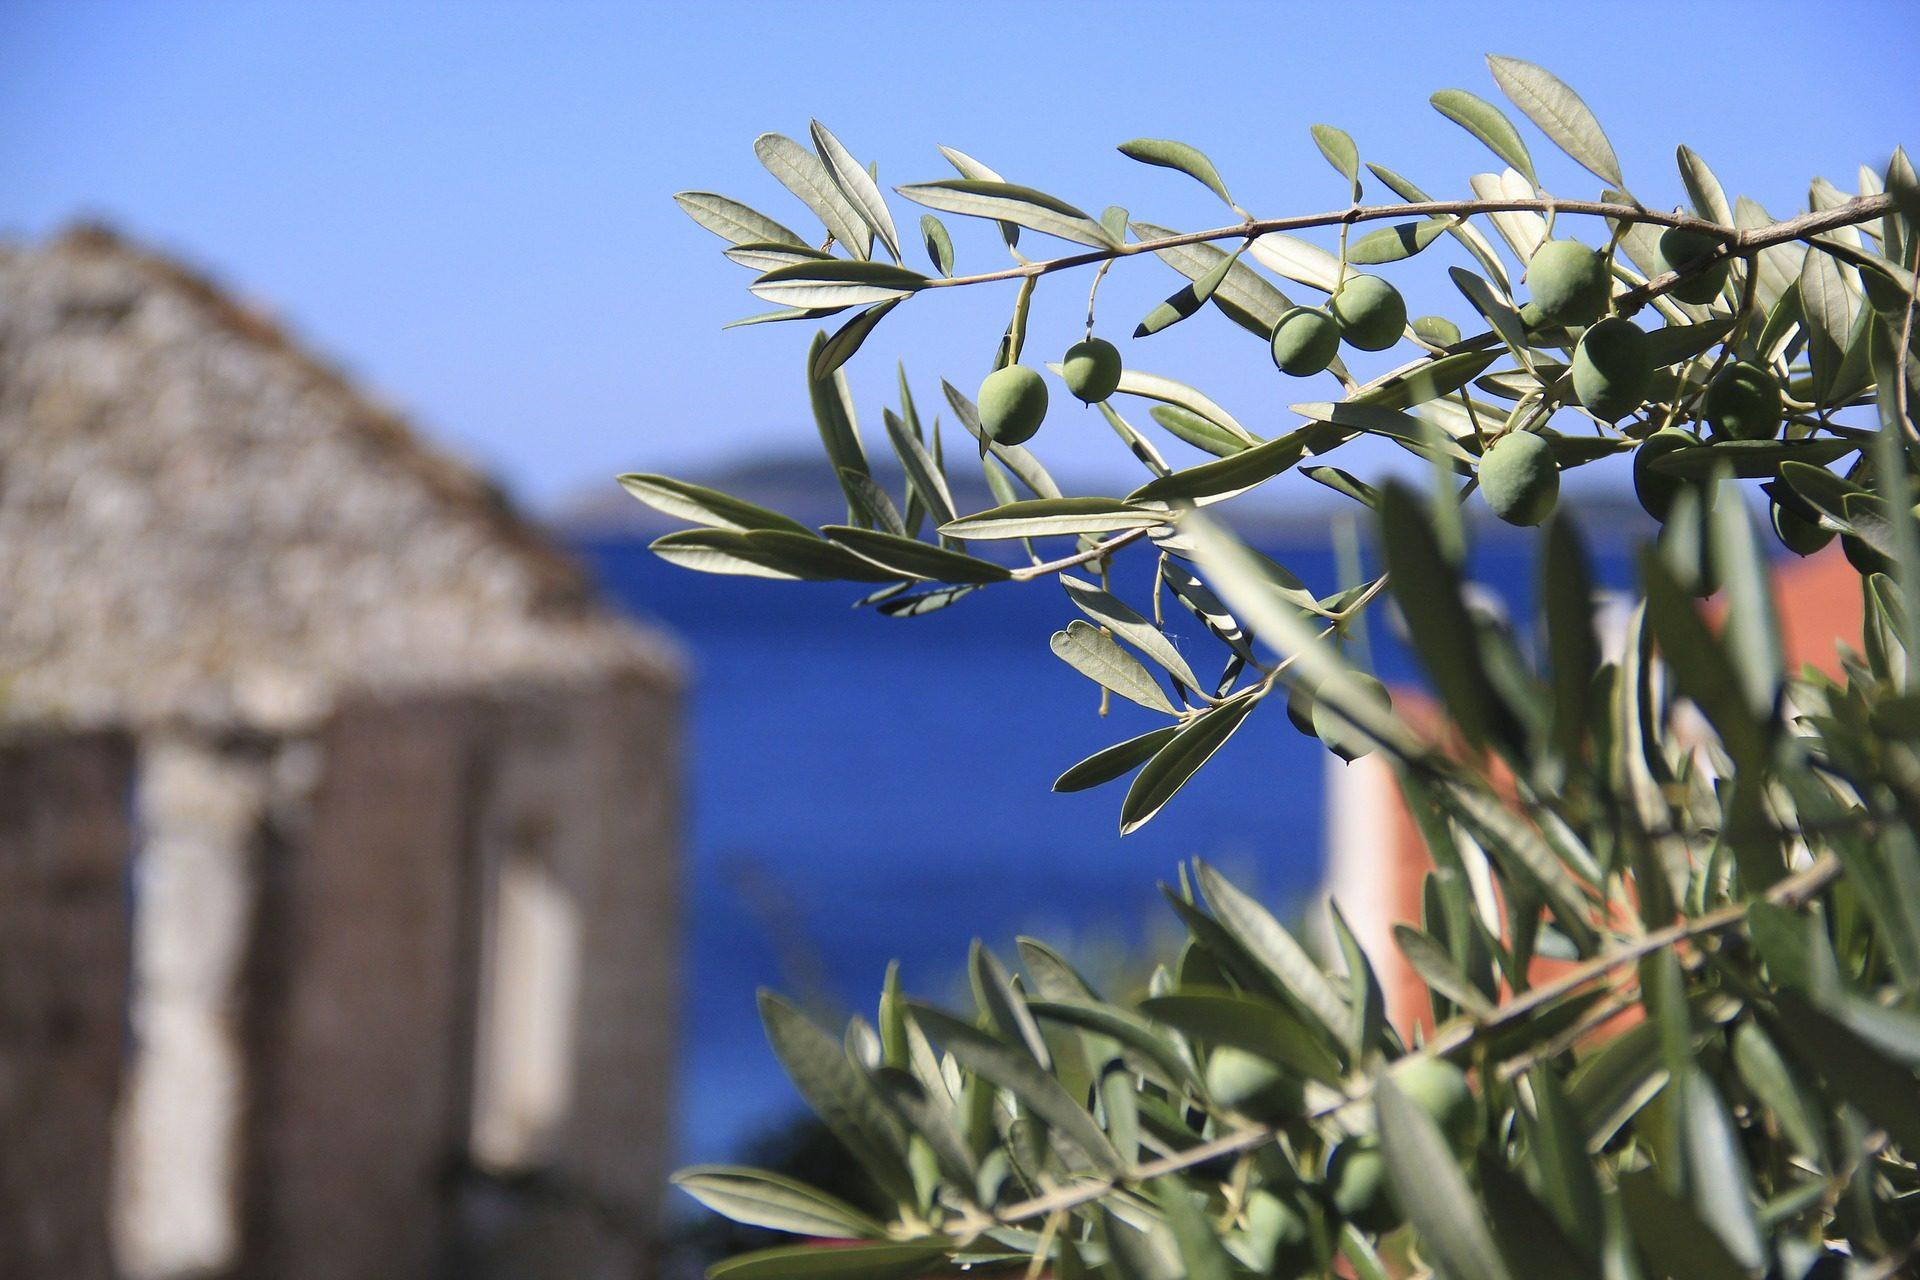 olivo, aceitunas, árbol, ramas, hojas, aceite, mediterráneo - Fondos de Pantalla HD - professor-falken.com